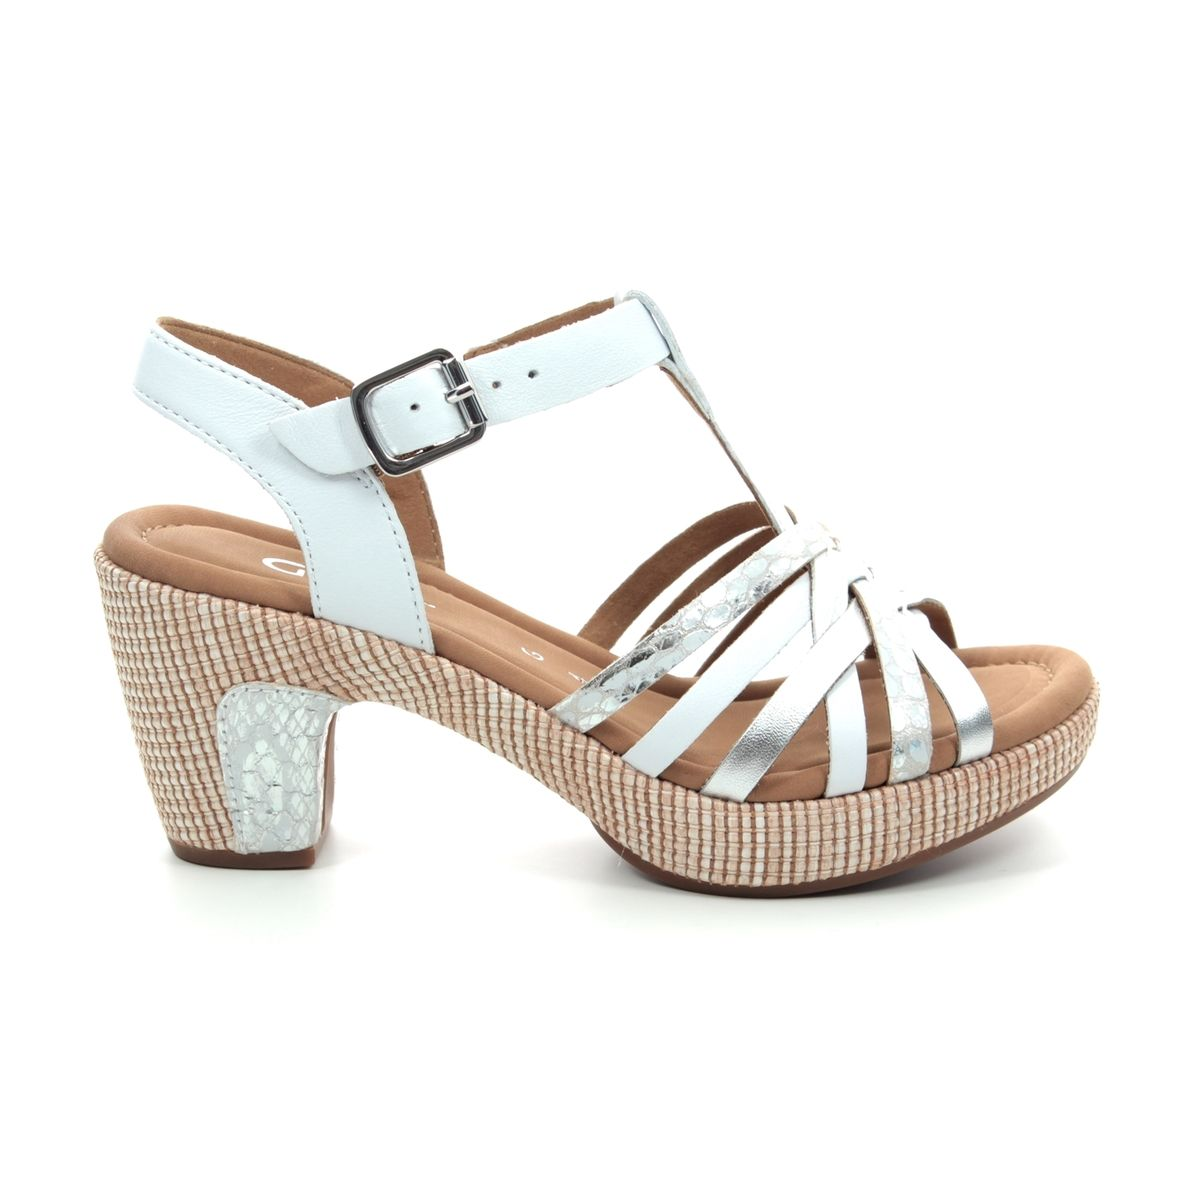 4d1c105d124a83 Gabor Heeled Sandals - White-silver - 22.736.51 CHERI